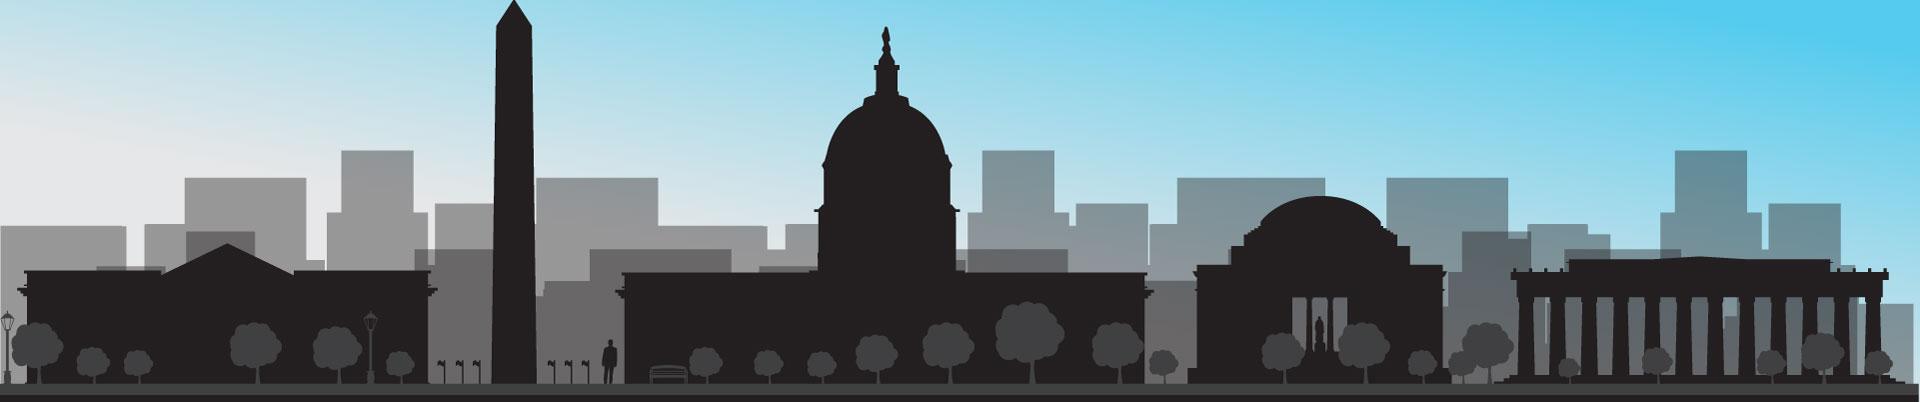 DC Tech Growth: A Snapshot